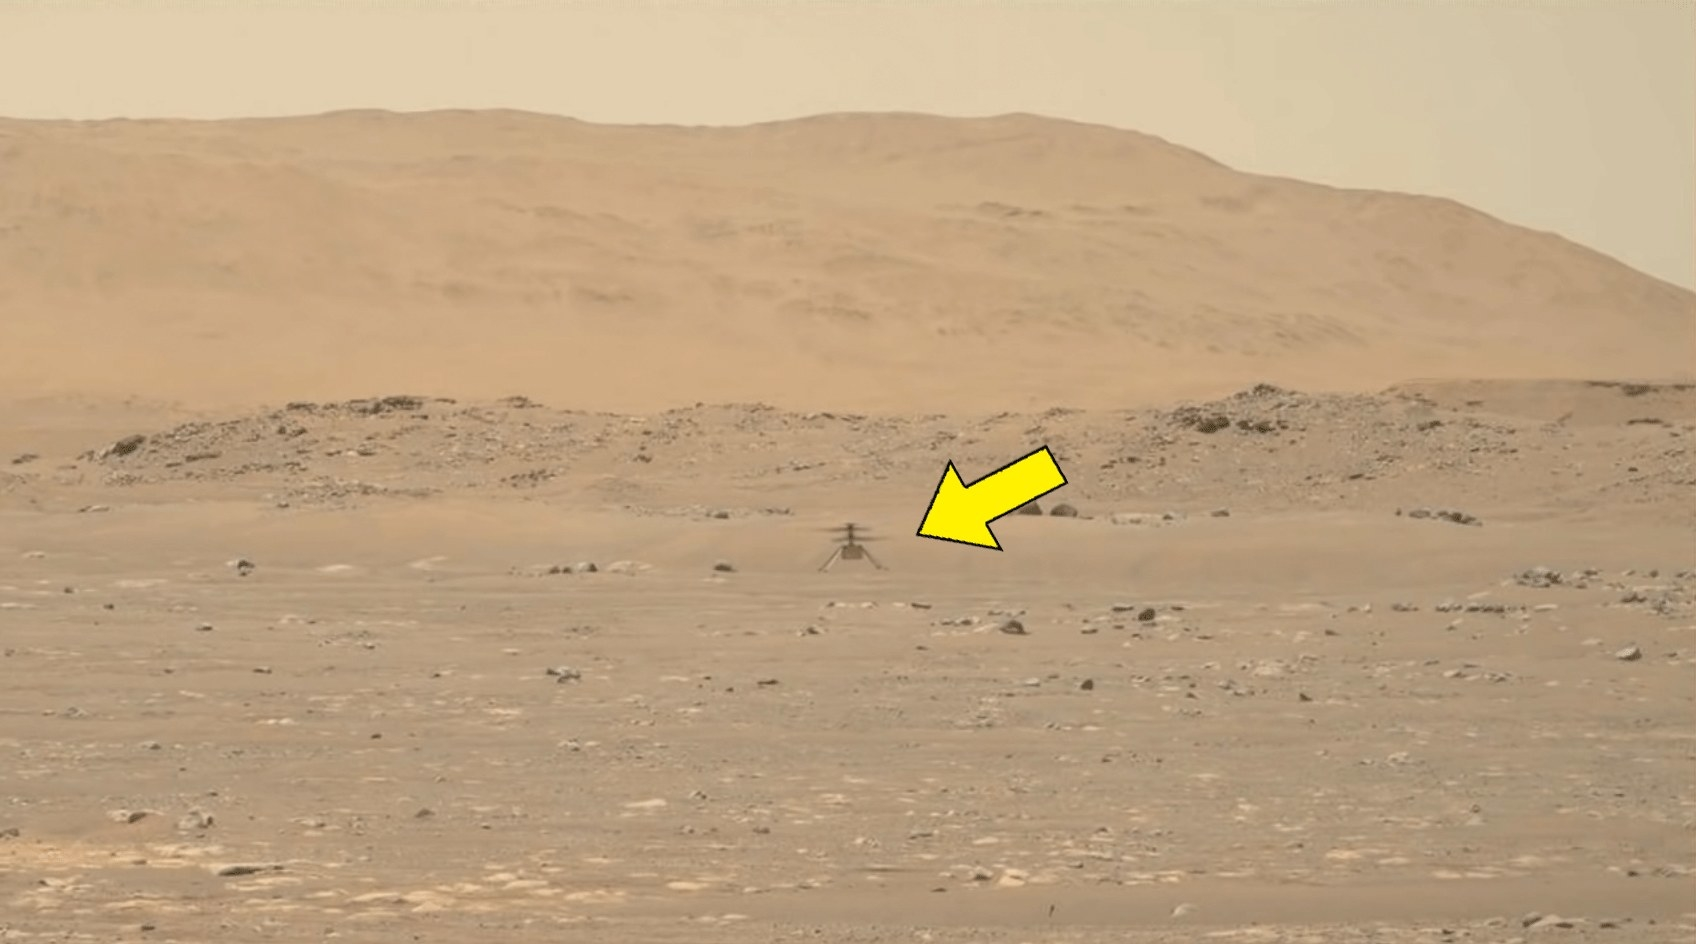 Ingenuity hovering above the Martian landscape